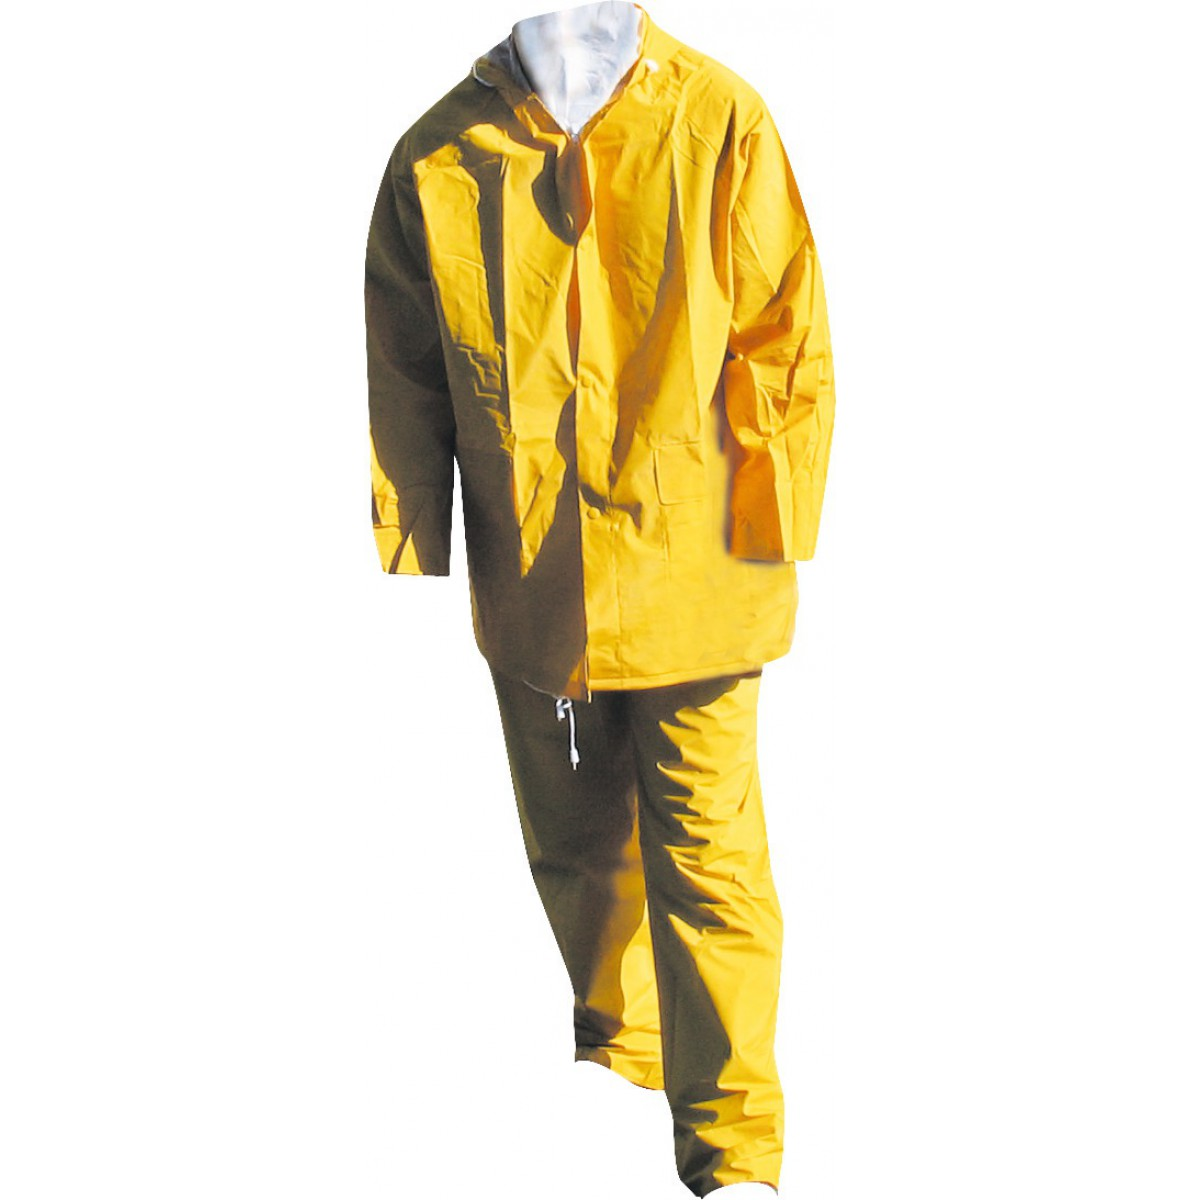 Ensemble de pluie jaune Lari - Taille L